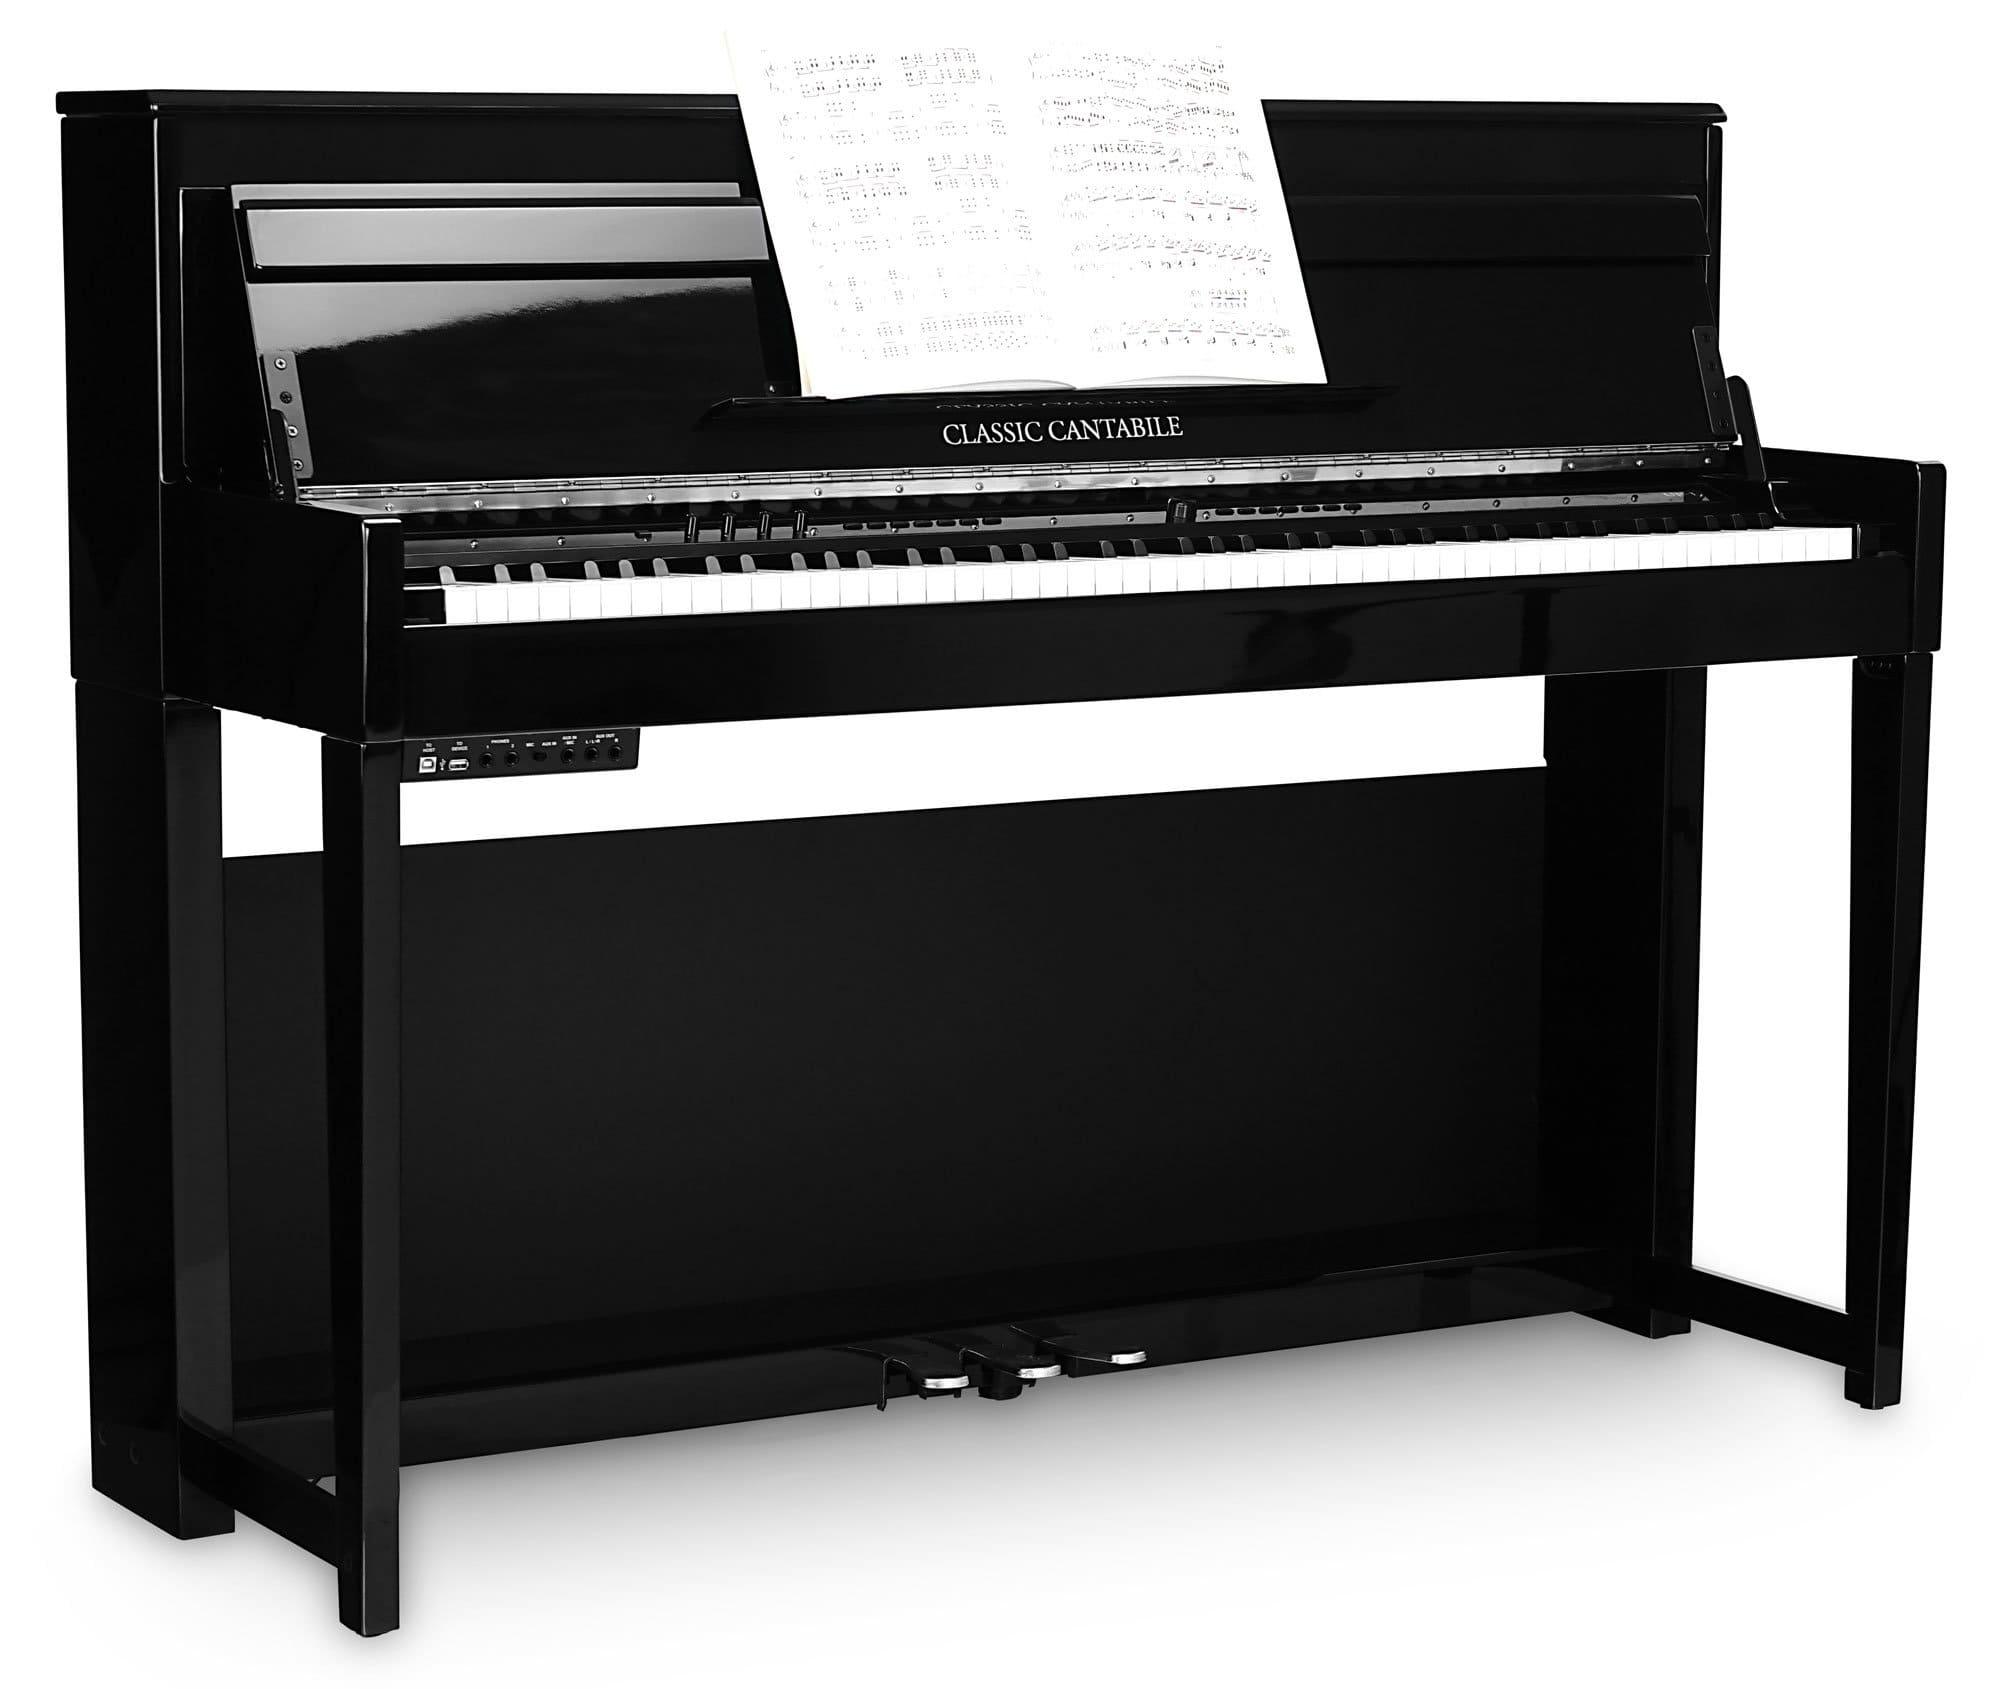 Classic cantabile up 1 sh upright e piano black high gloss for Classic house piano